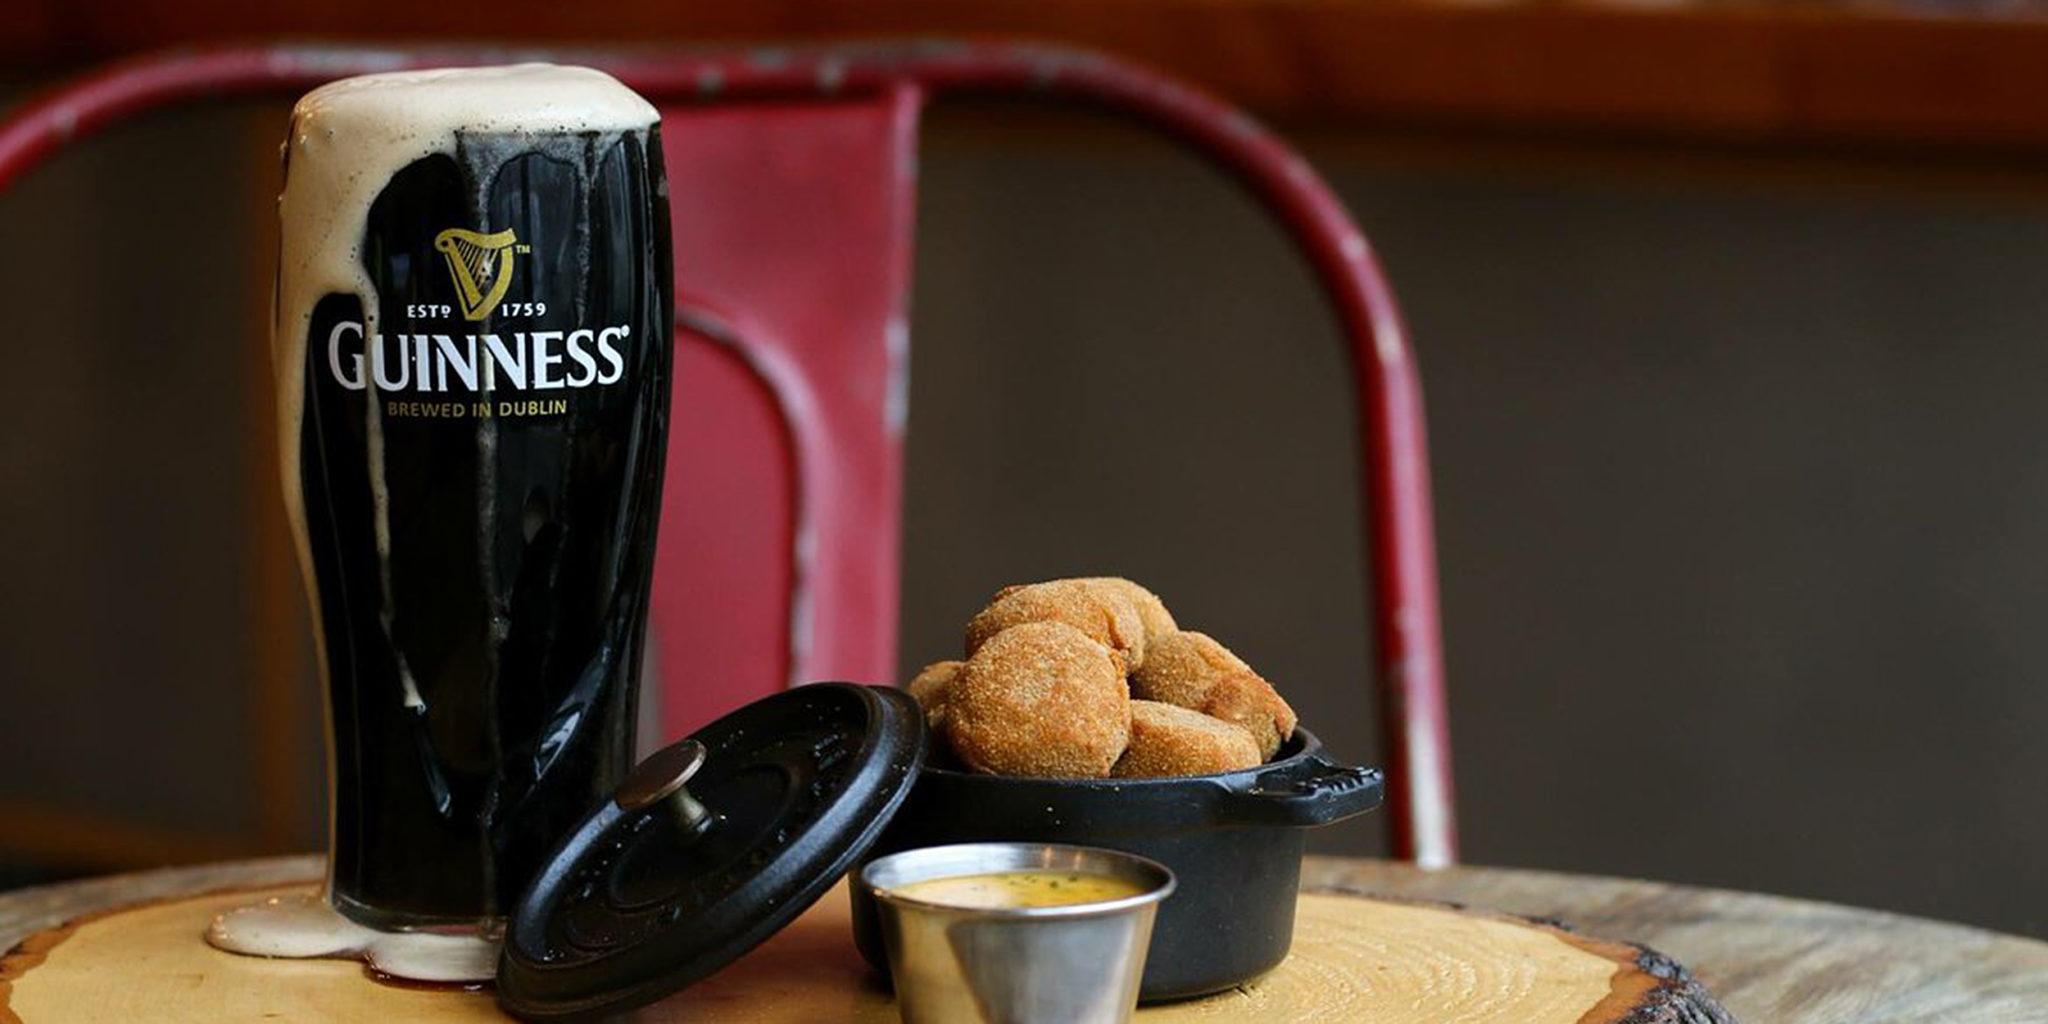 Horribly-poured Guinness